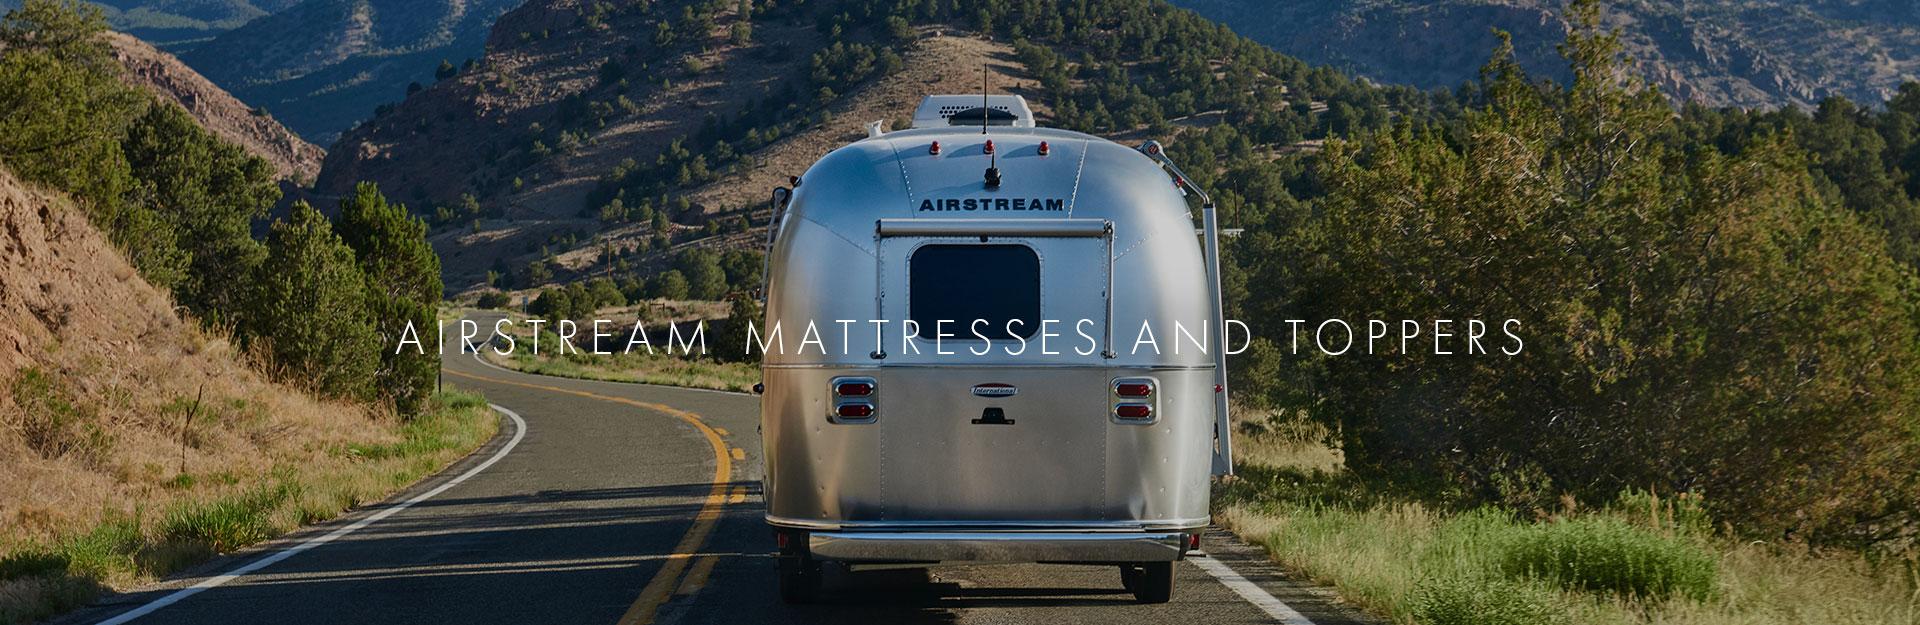 airstreammattress.jpg